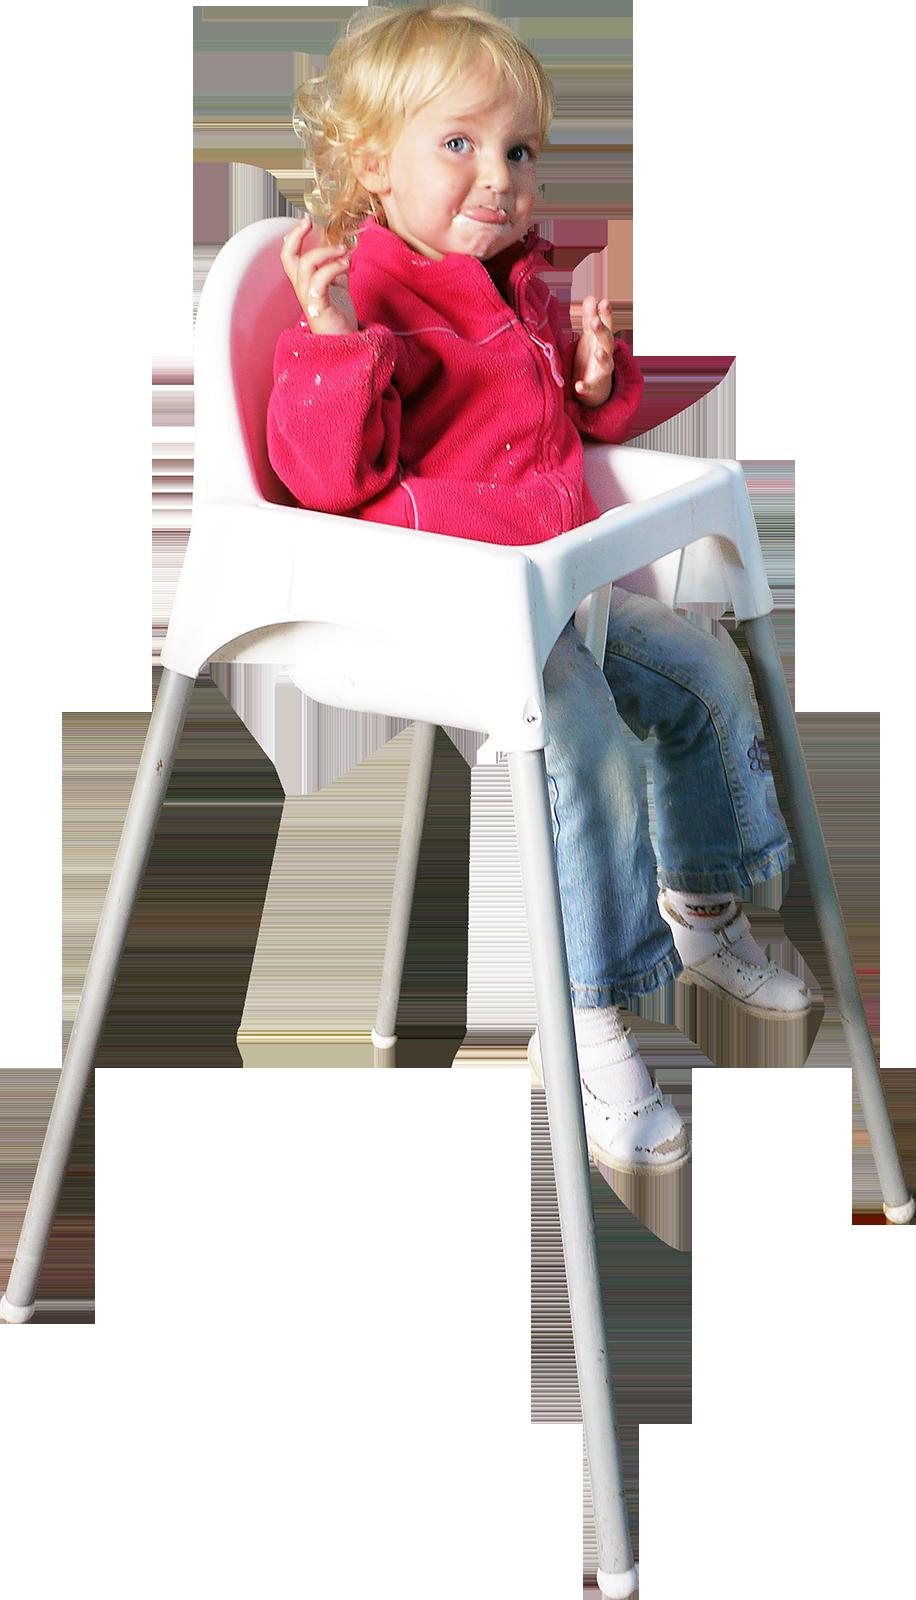 Child Sitting In Chair